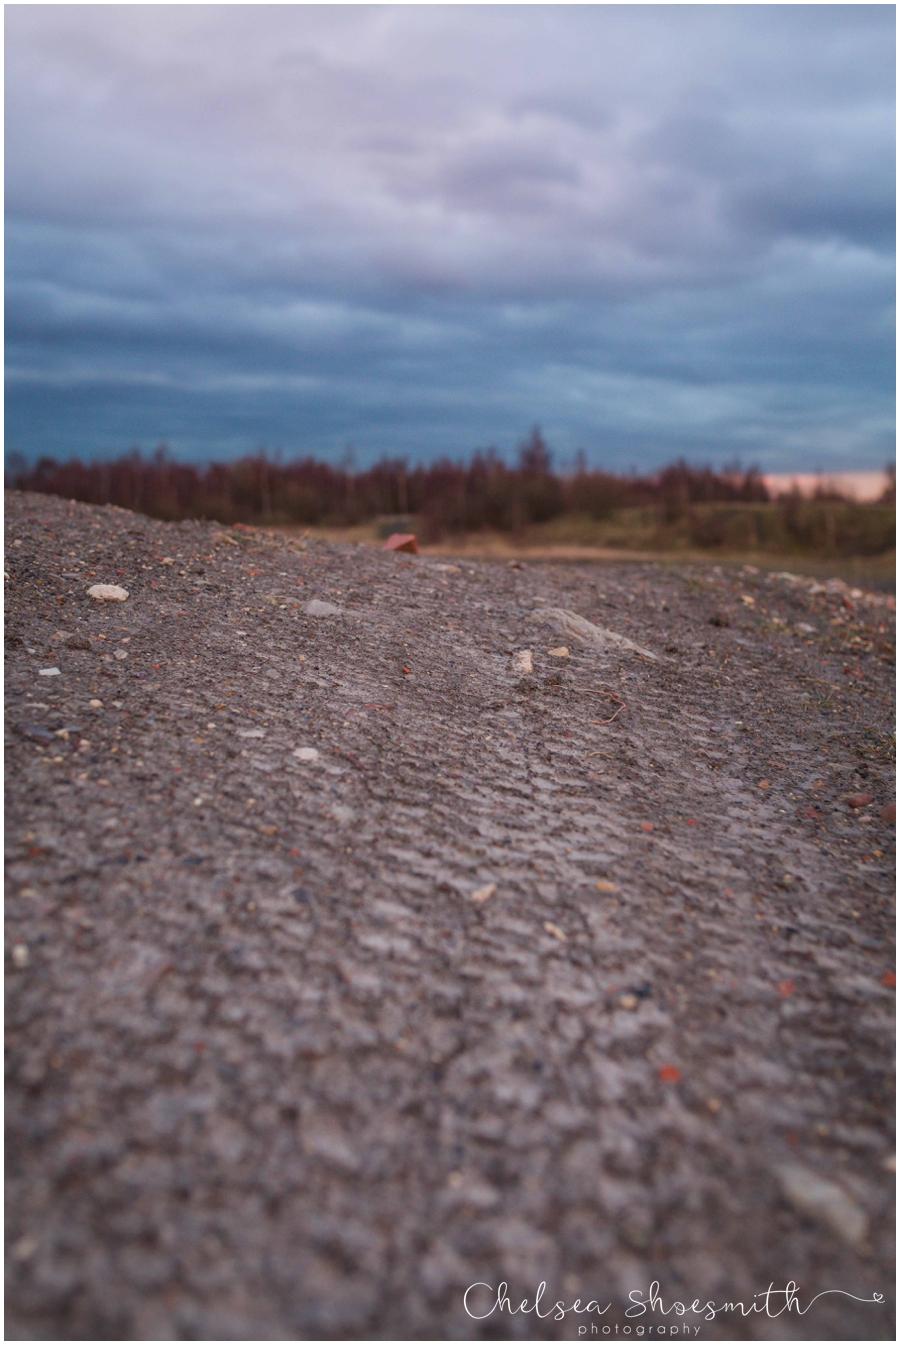 (11 of 18) Humberhead peatlands nature photography chelsea shoesmith photography yorkshire photographer_